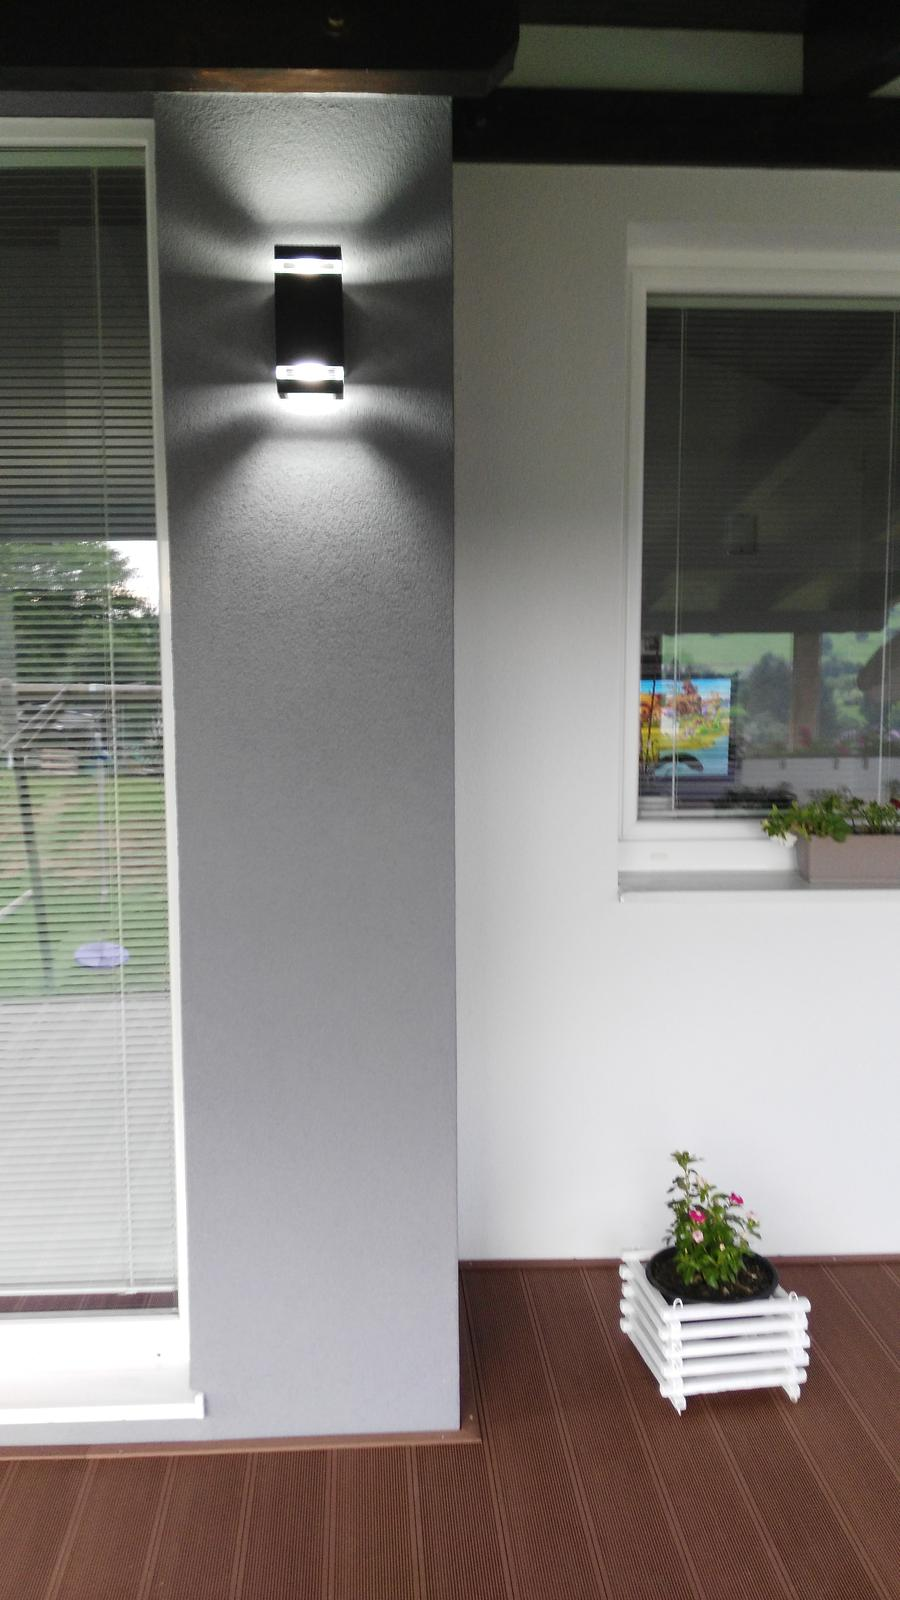 Domček na kopčeku - nove svetla zapojene